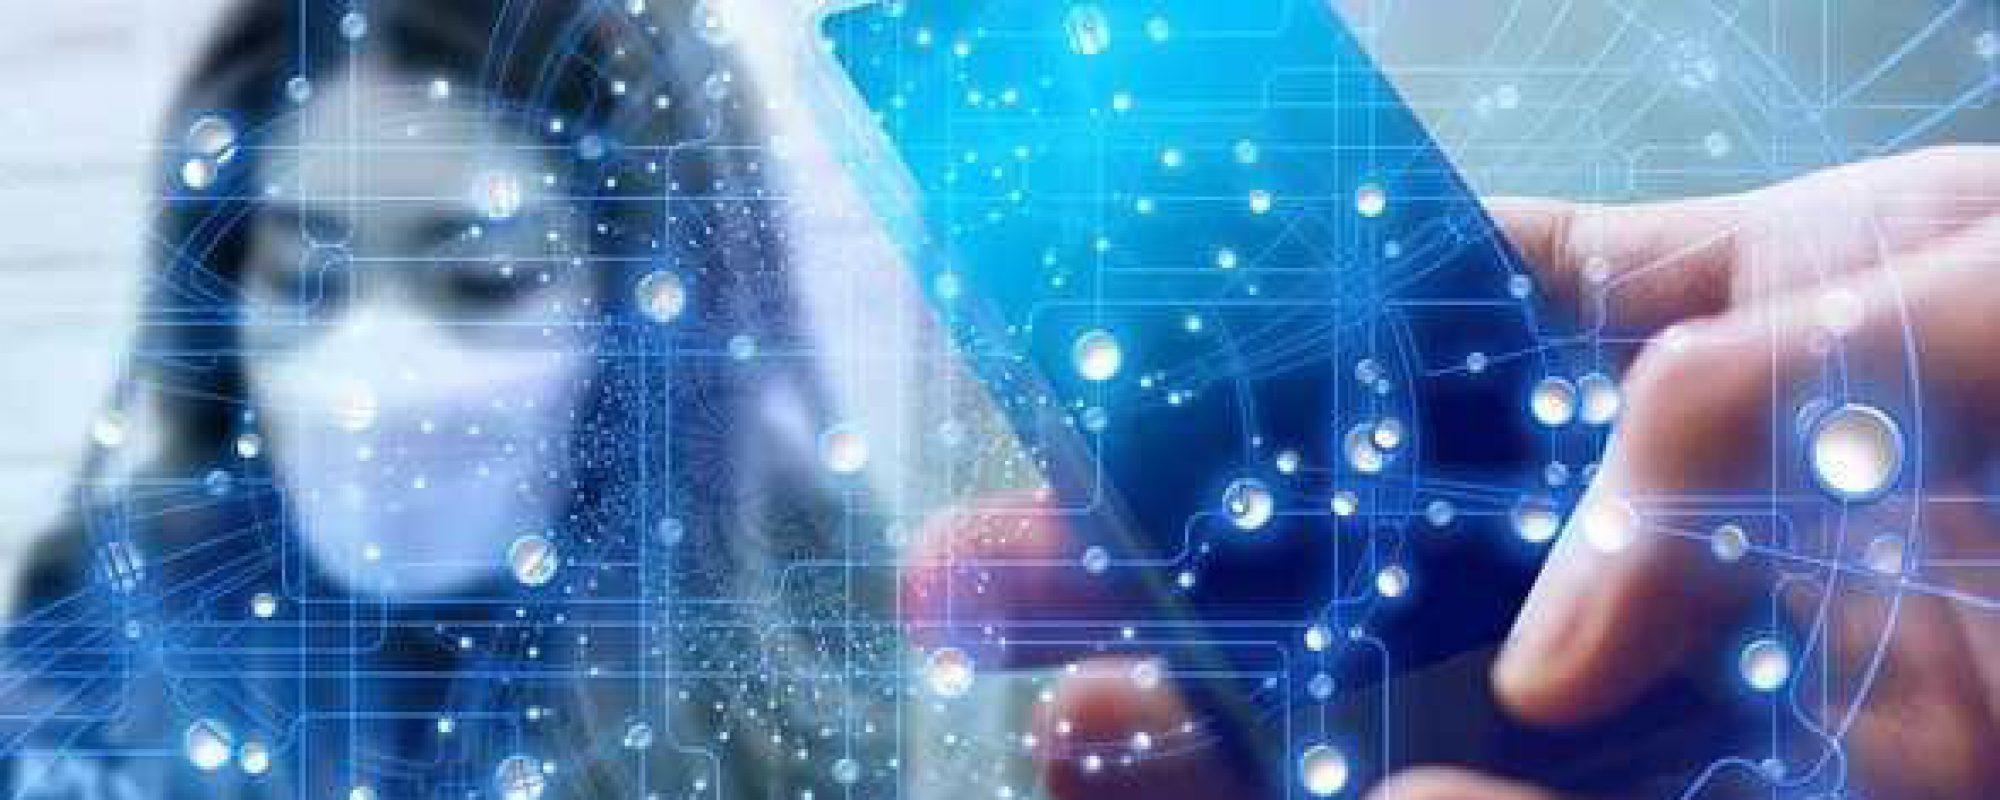 digitalizacion-transformaciondigital